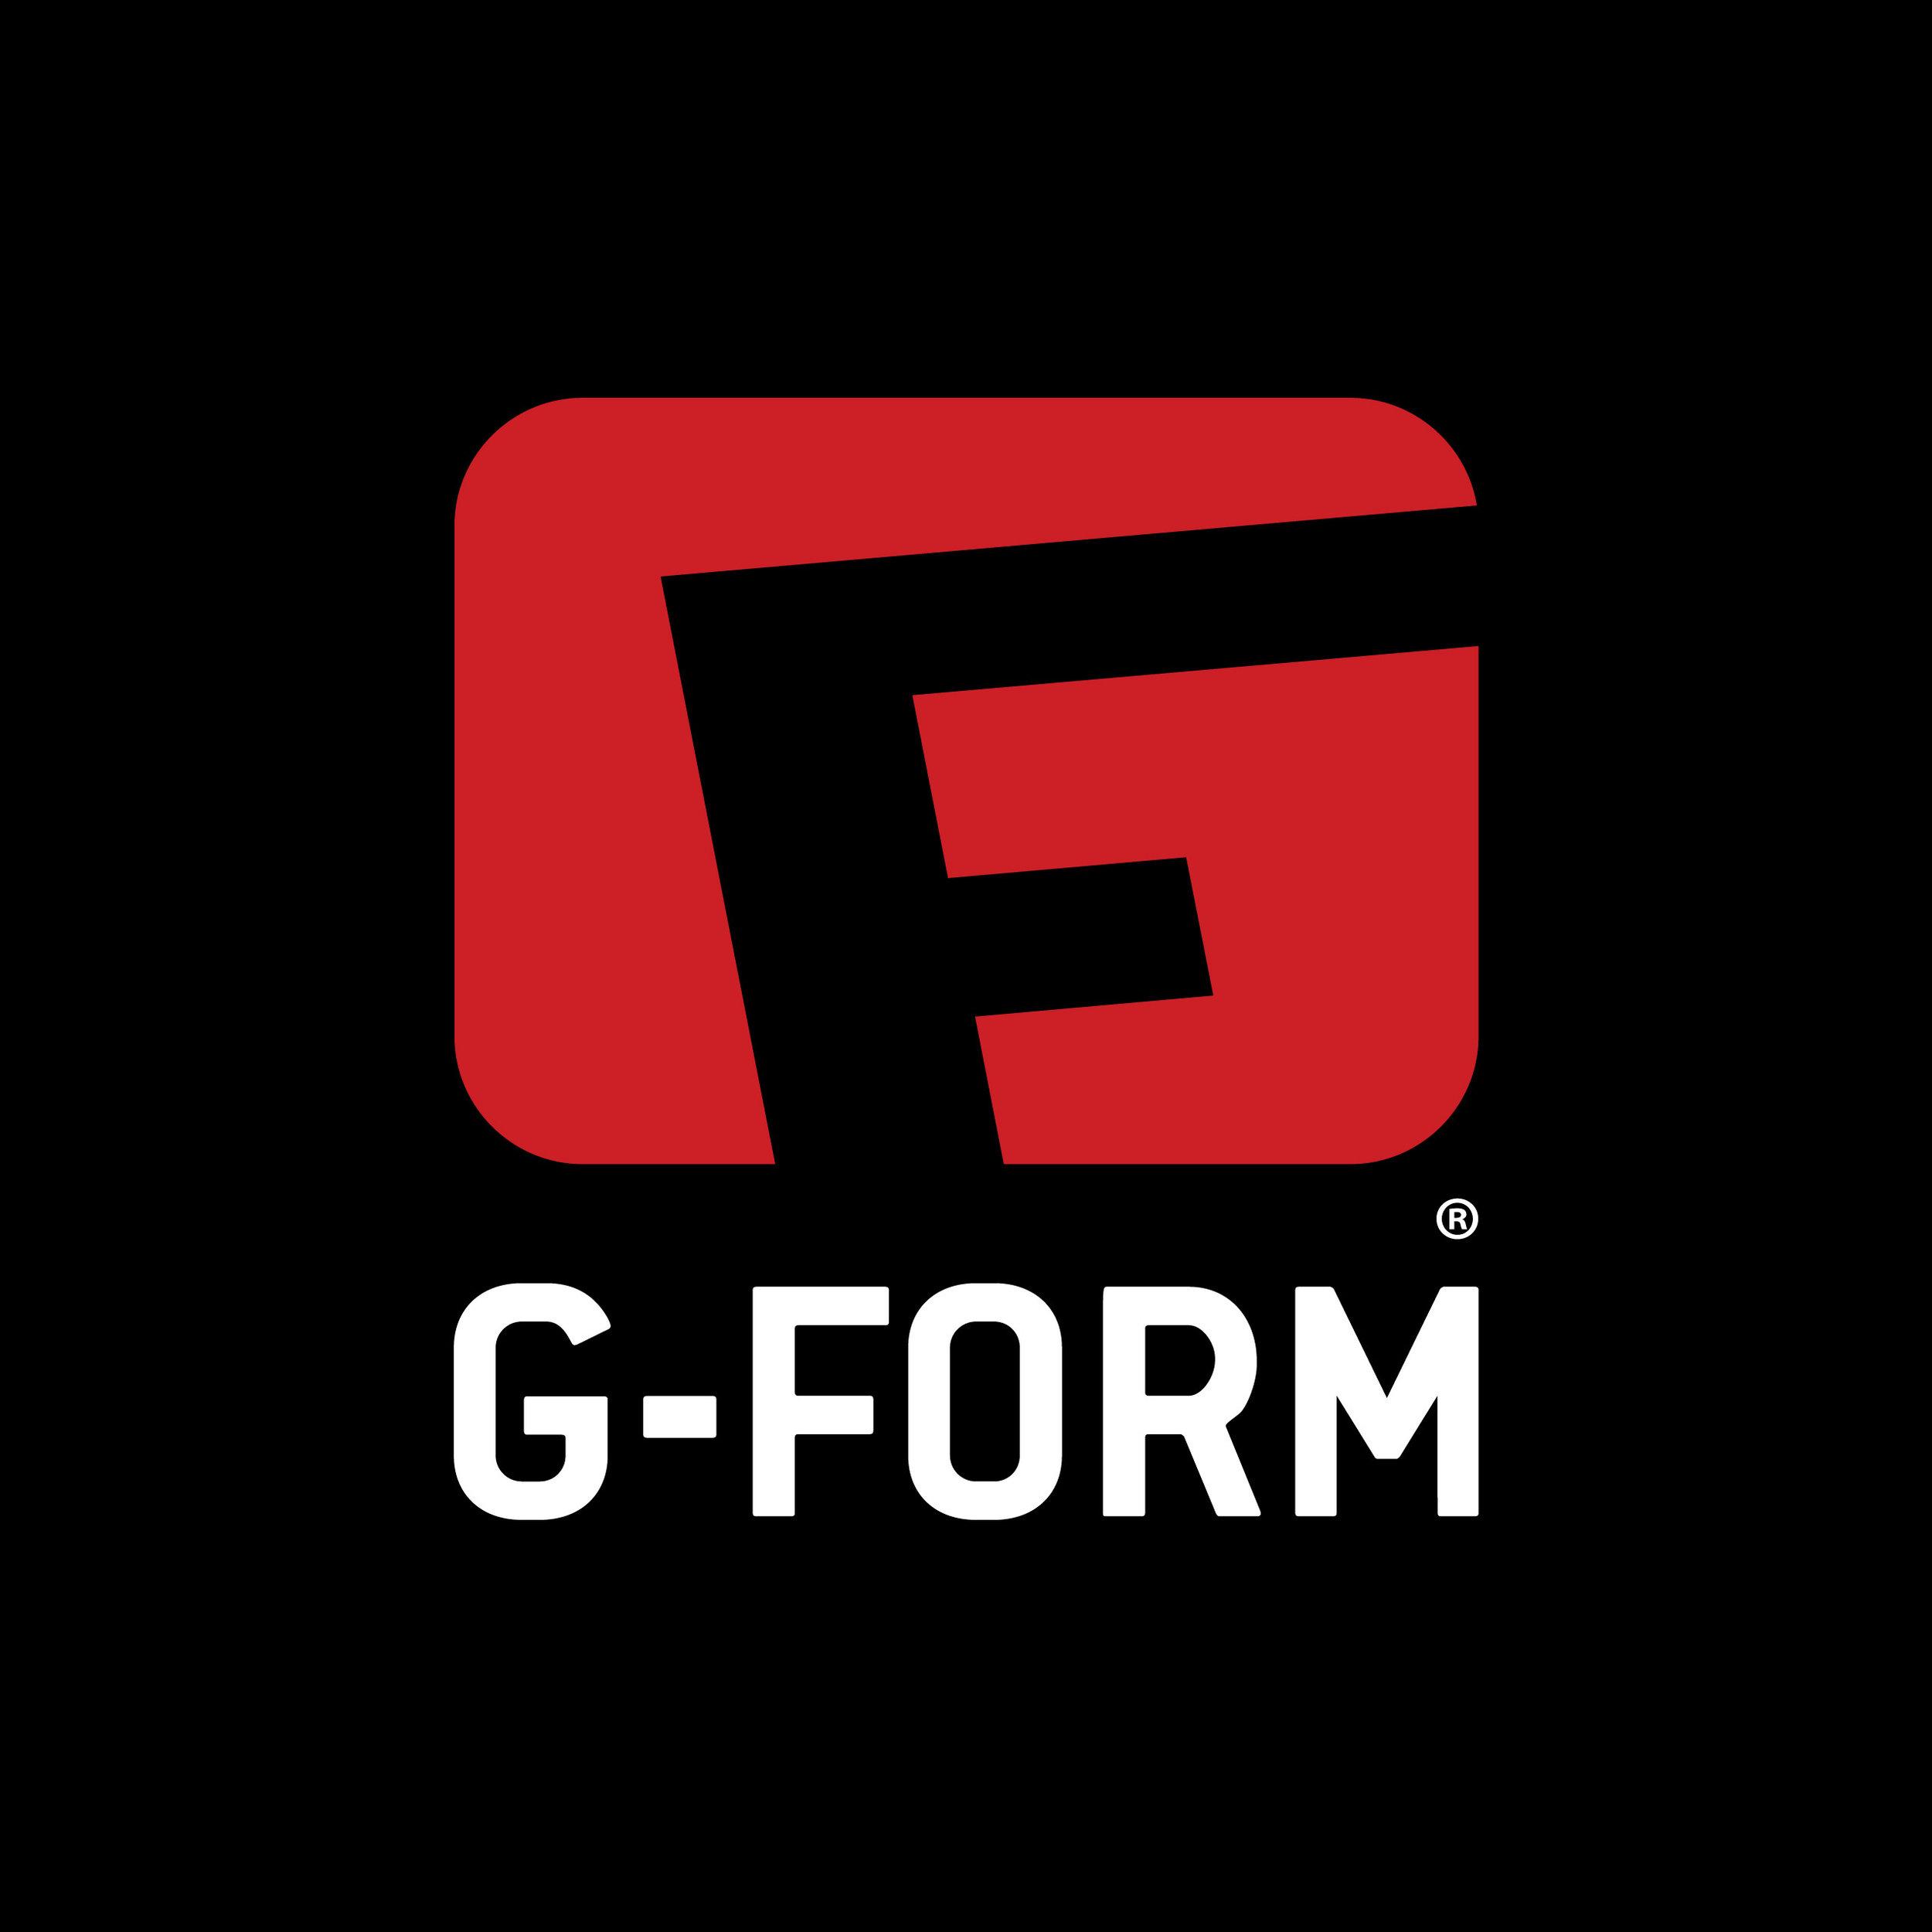 Copy of G-Form